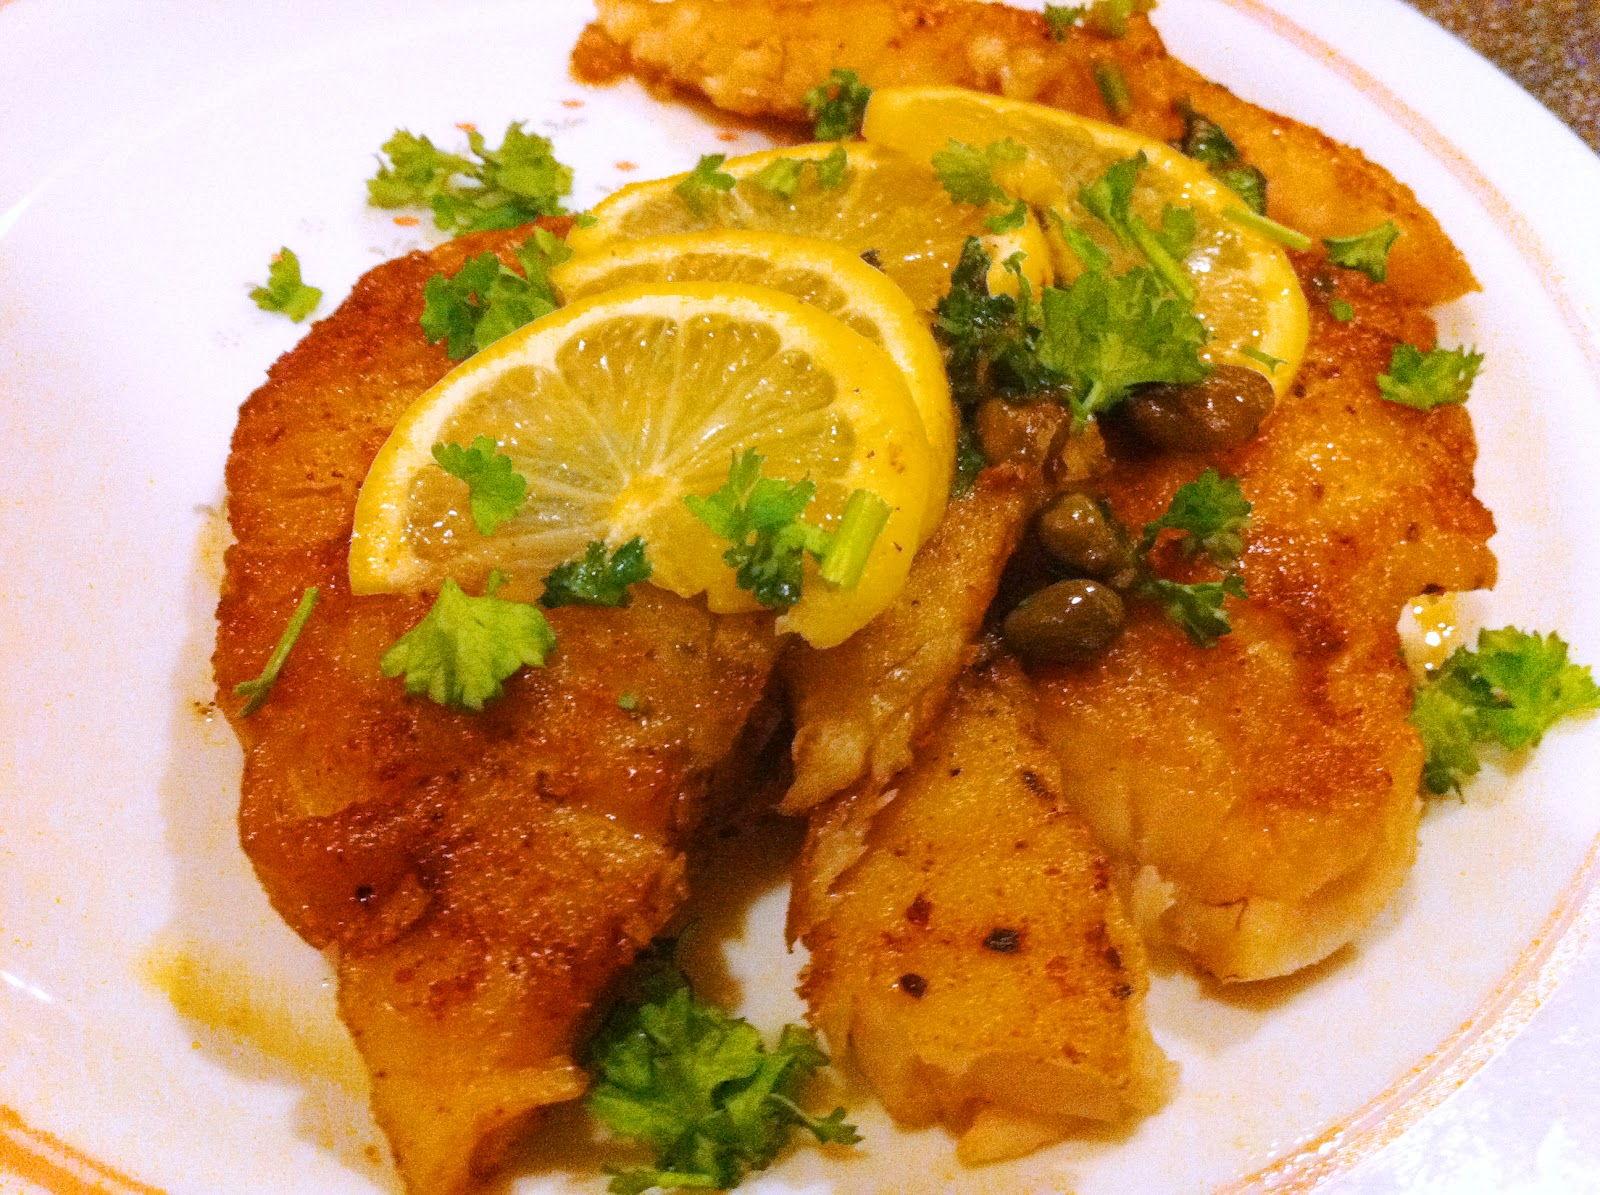 Ryba w marynowanej cytrynie